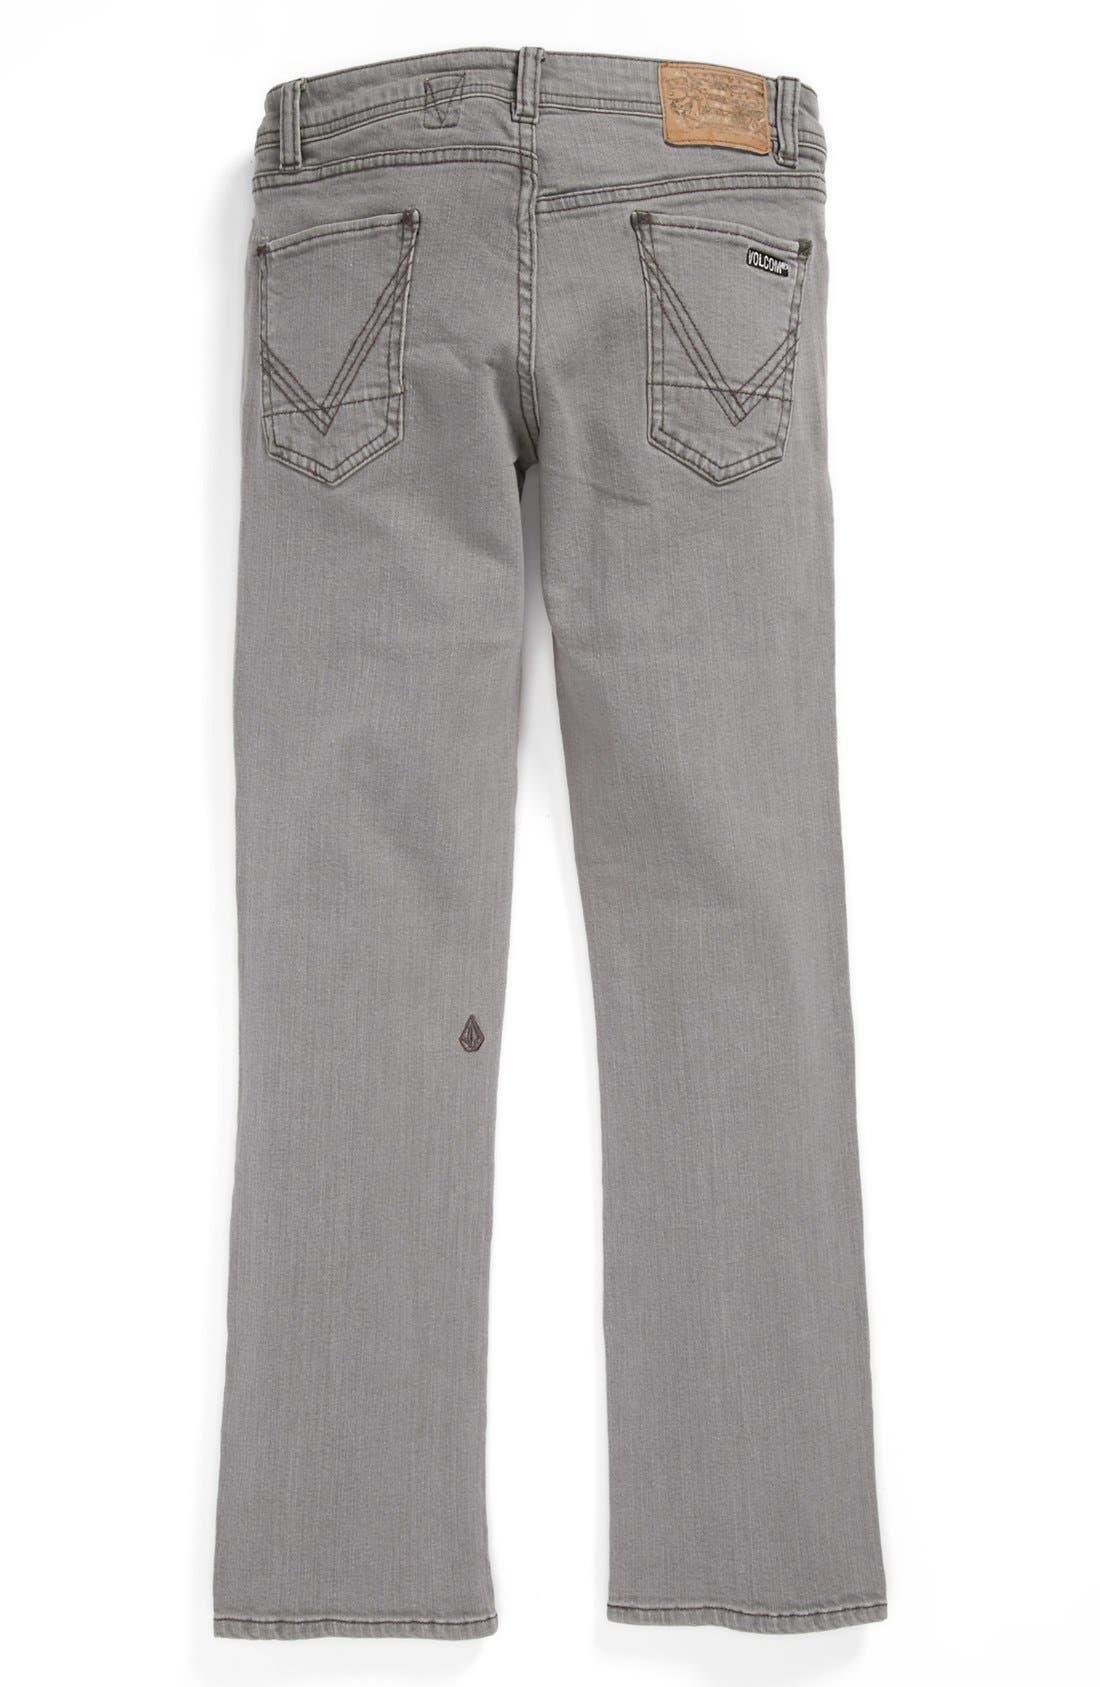 Alternate Image 1 Selected - Volcom 'Vorta' Jeans (Big Boys)